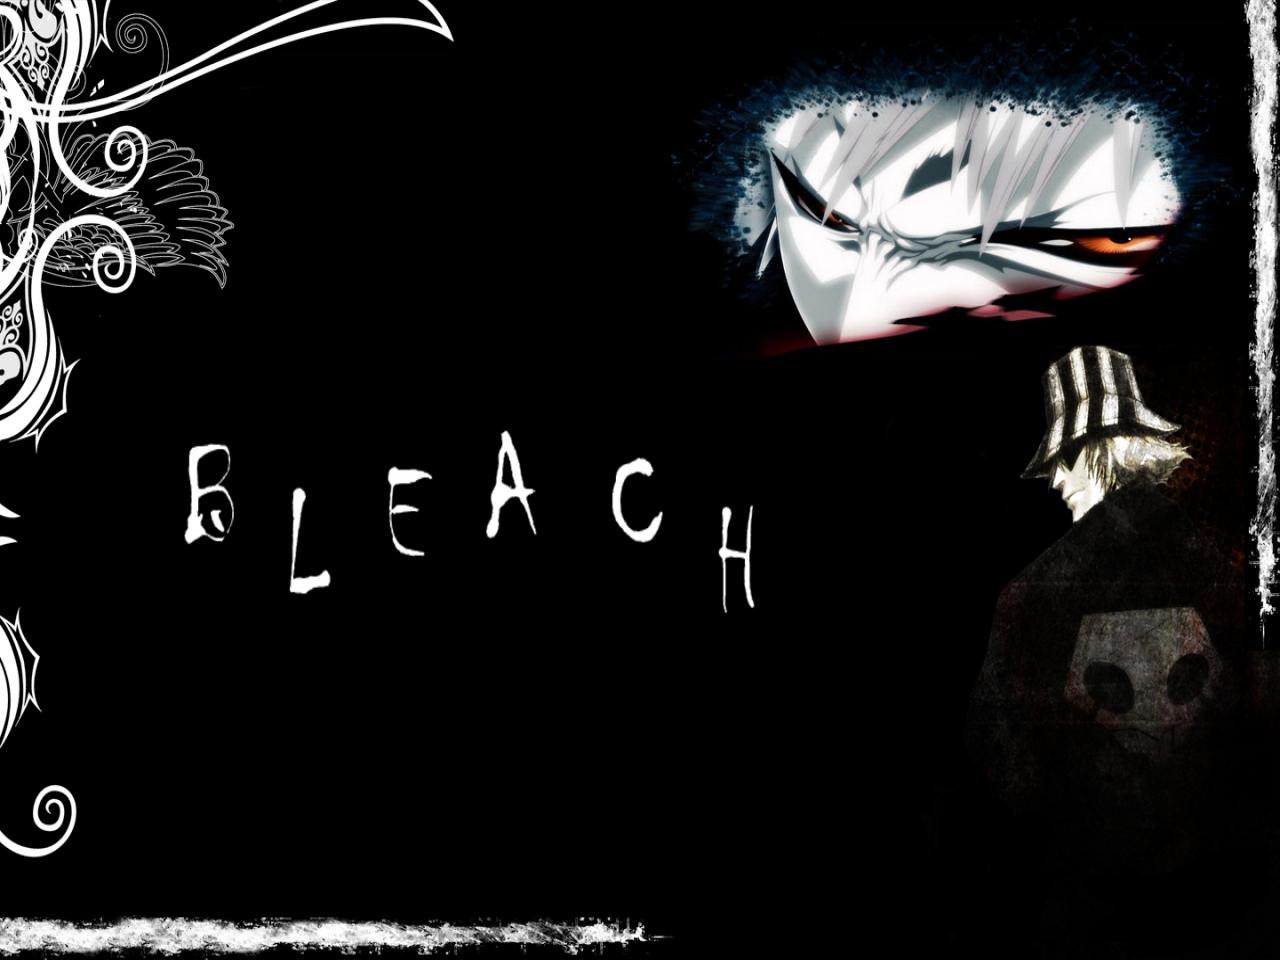 http://3.bp.blogspot.com/-QwTrs-XUkec/TwyBJKXIeNI/AAAAAAAABgc/uuuQ8iPBzZQ/s1600/bleach-wallpaper-by-gokaichi.jpg